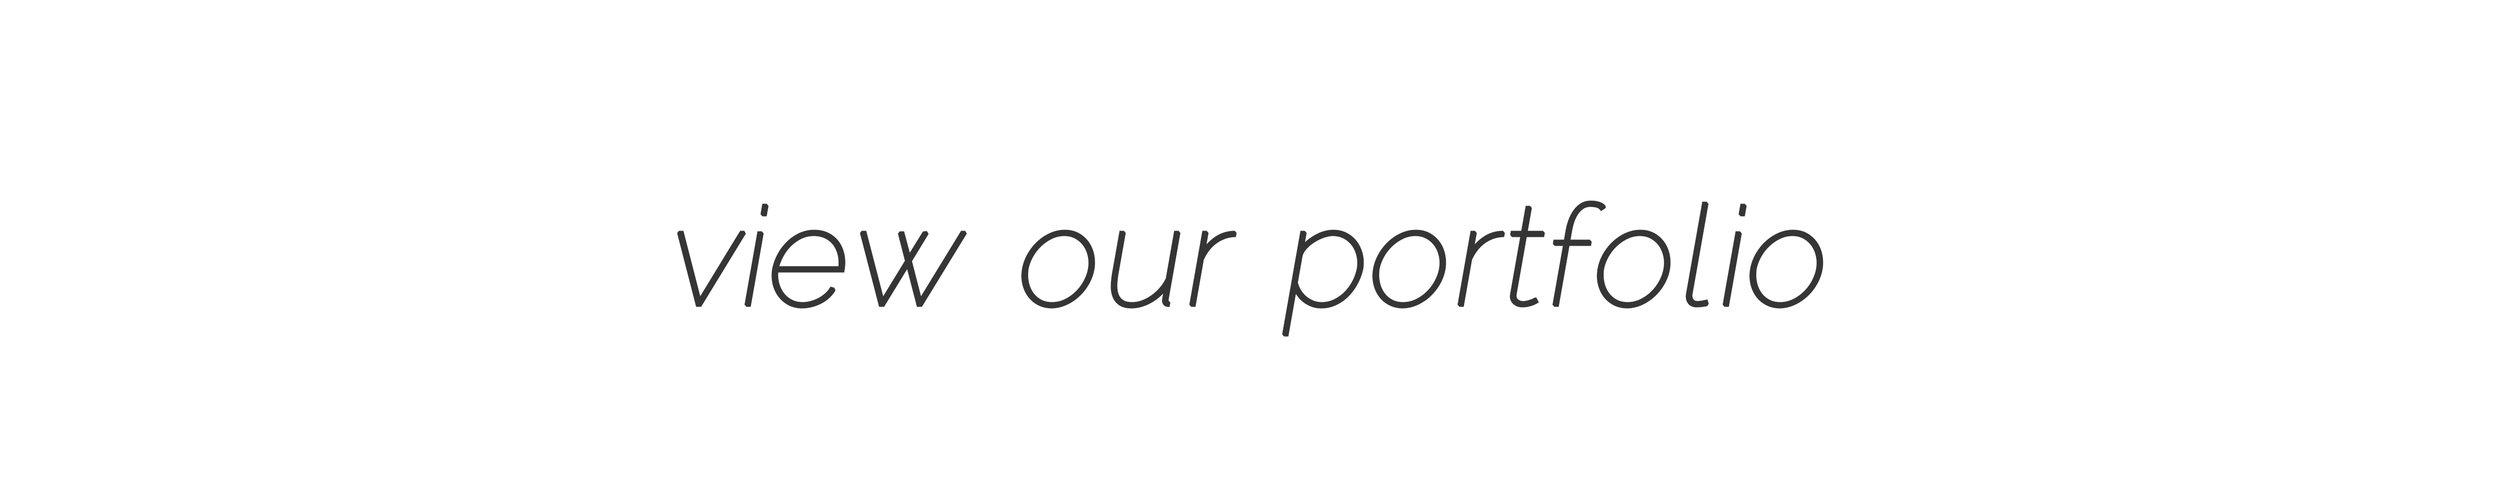 portfolio view_.jpg